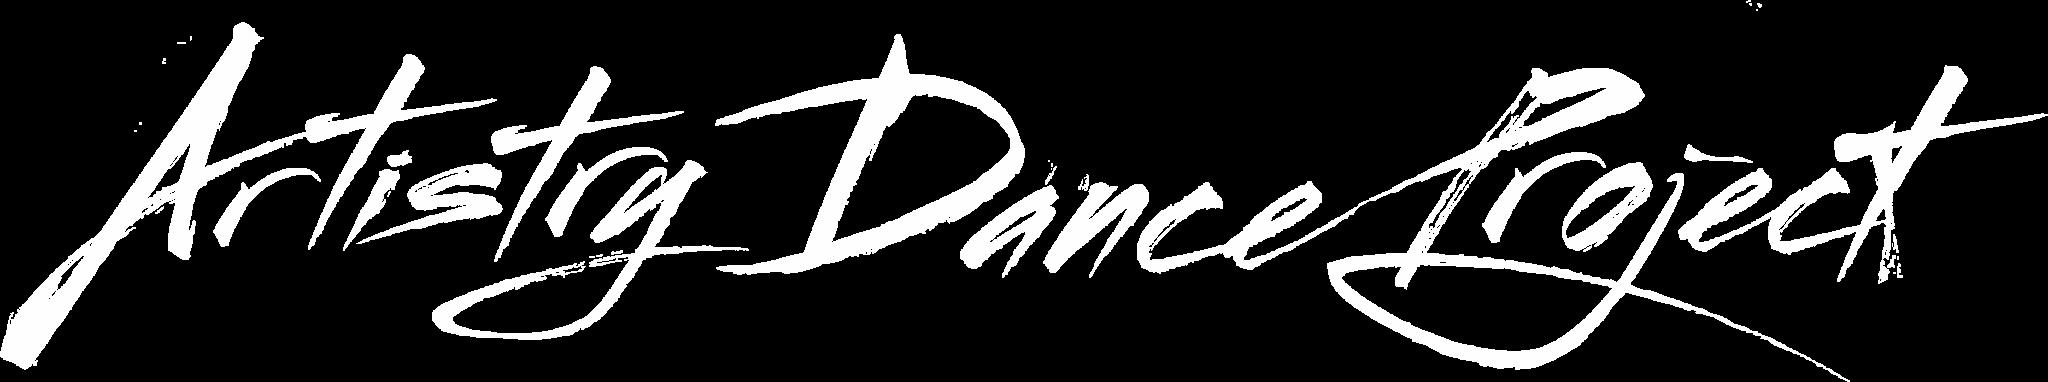 Artistry Dance Project Logo